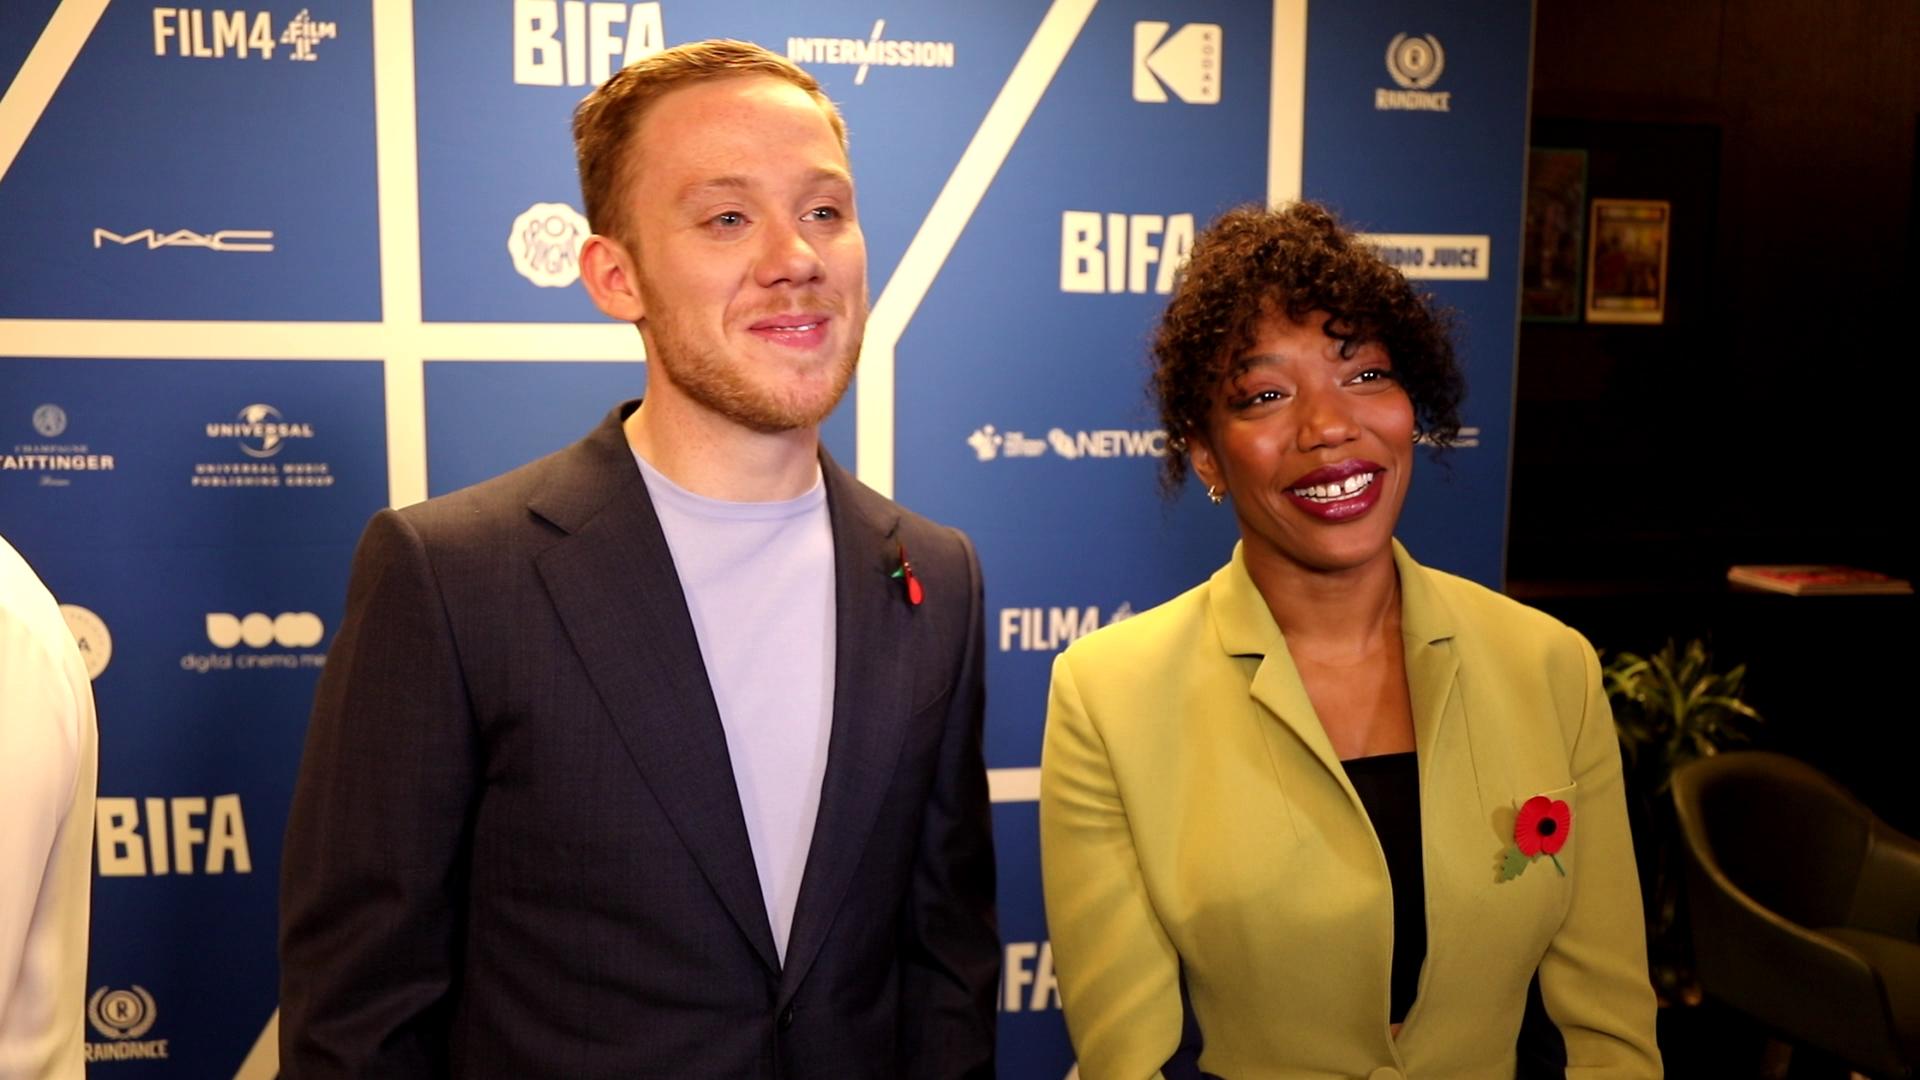 bifa-nominations-heyuguys